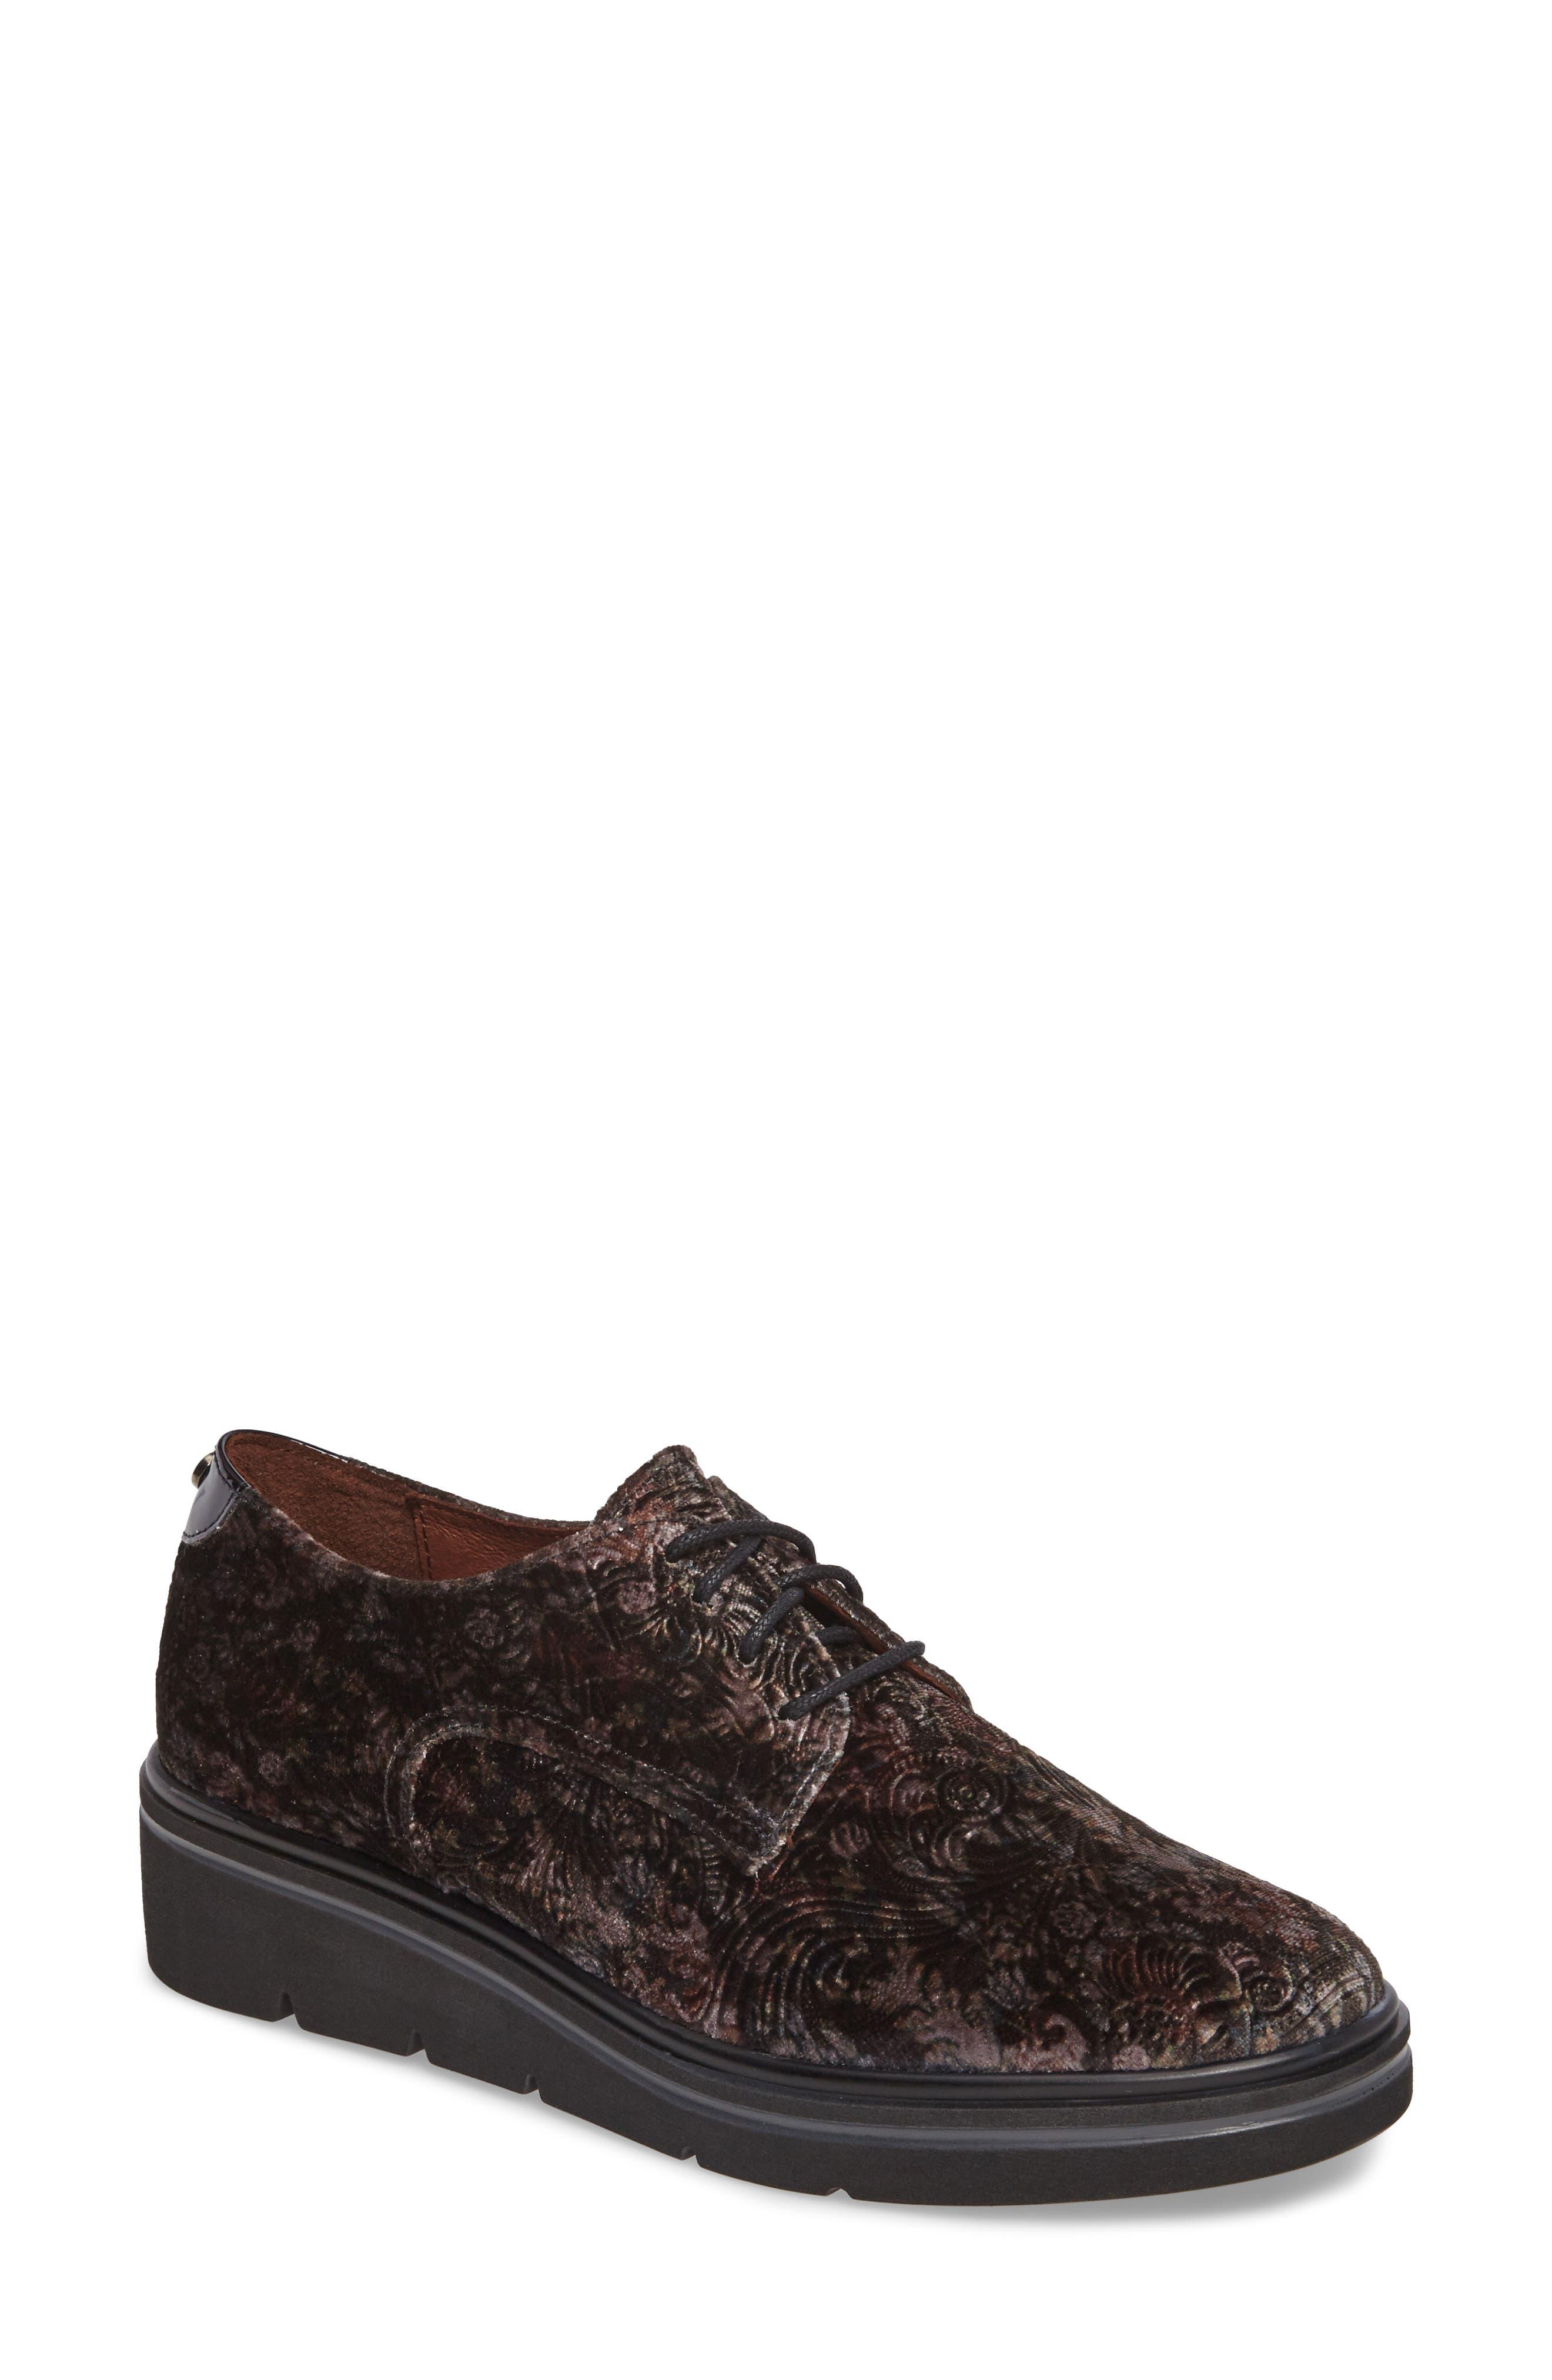 HISPANITAS Richelle Oxford Sneaker, Main, color, GREY FABRIC